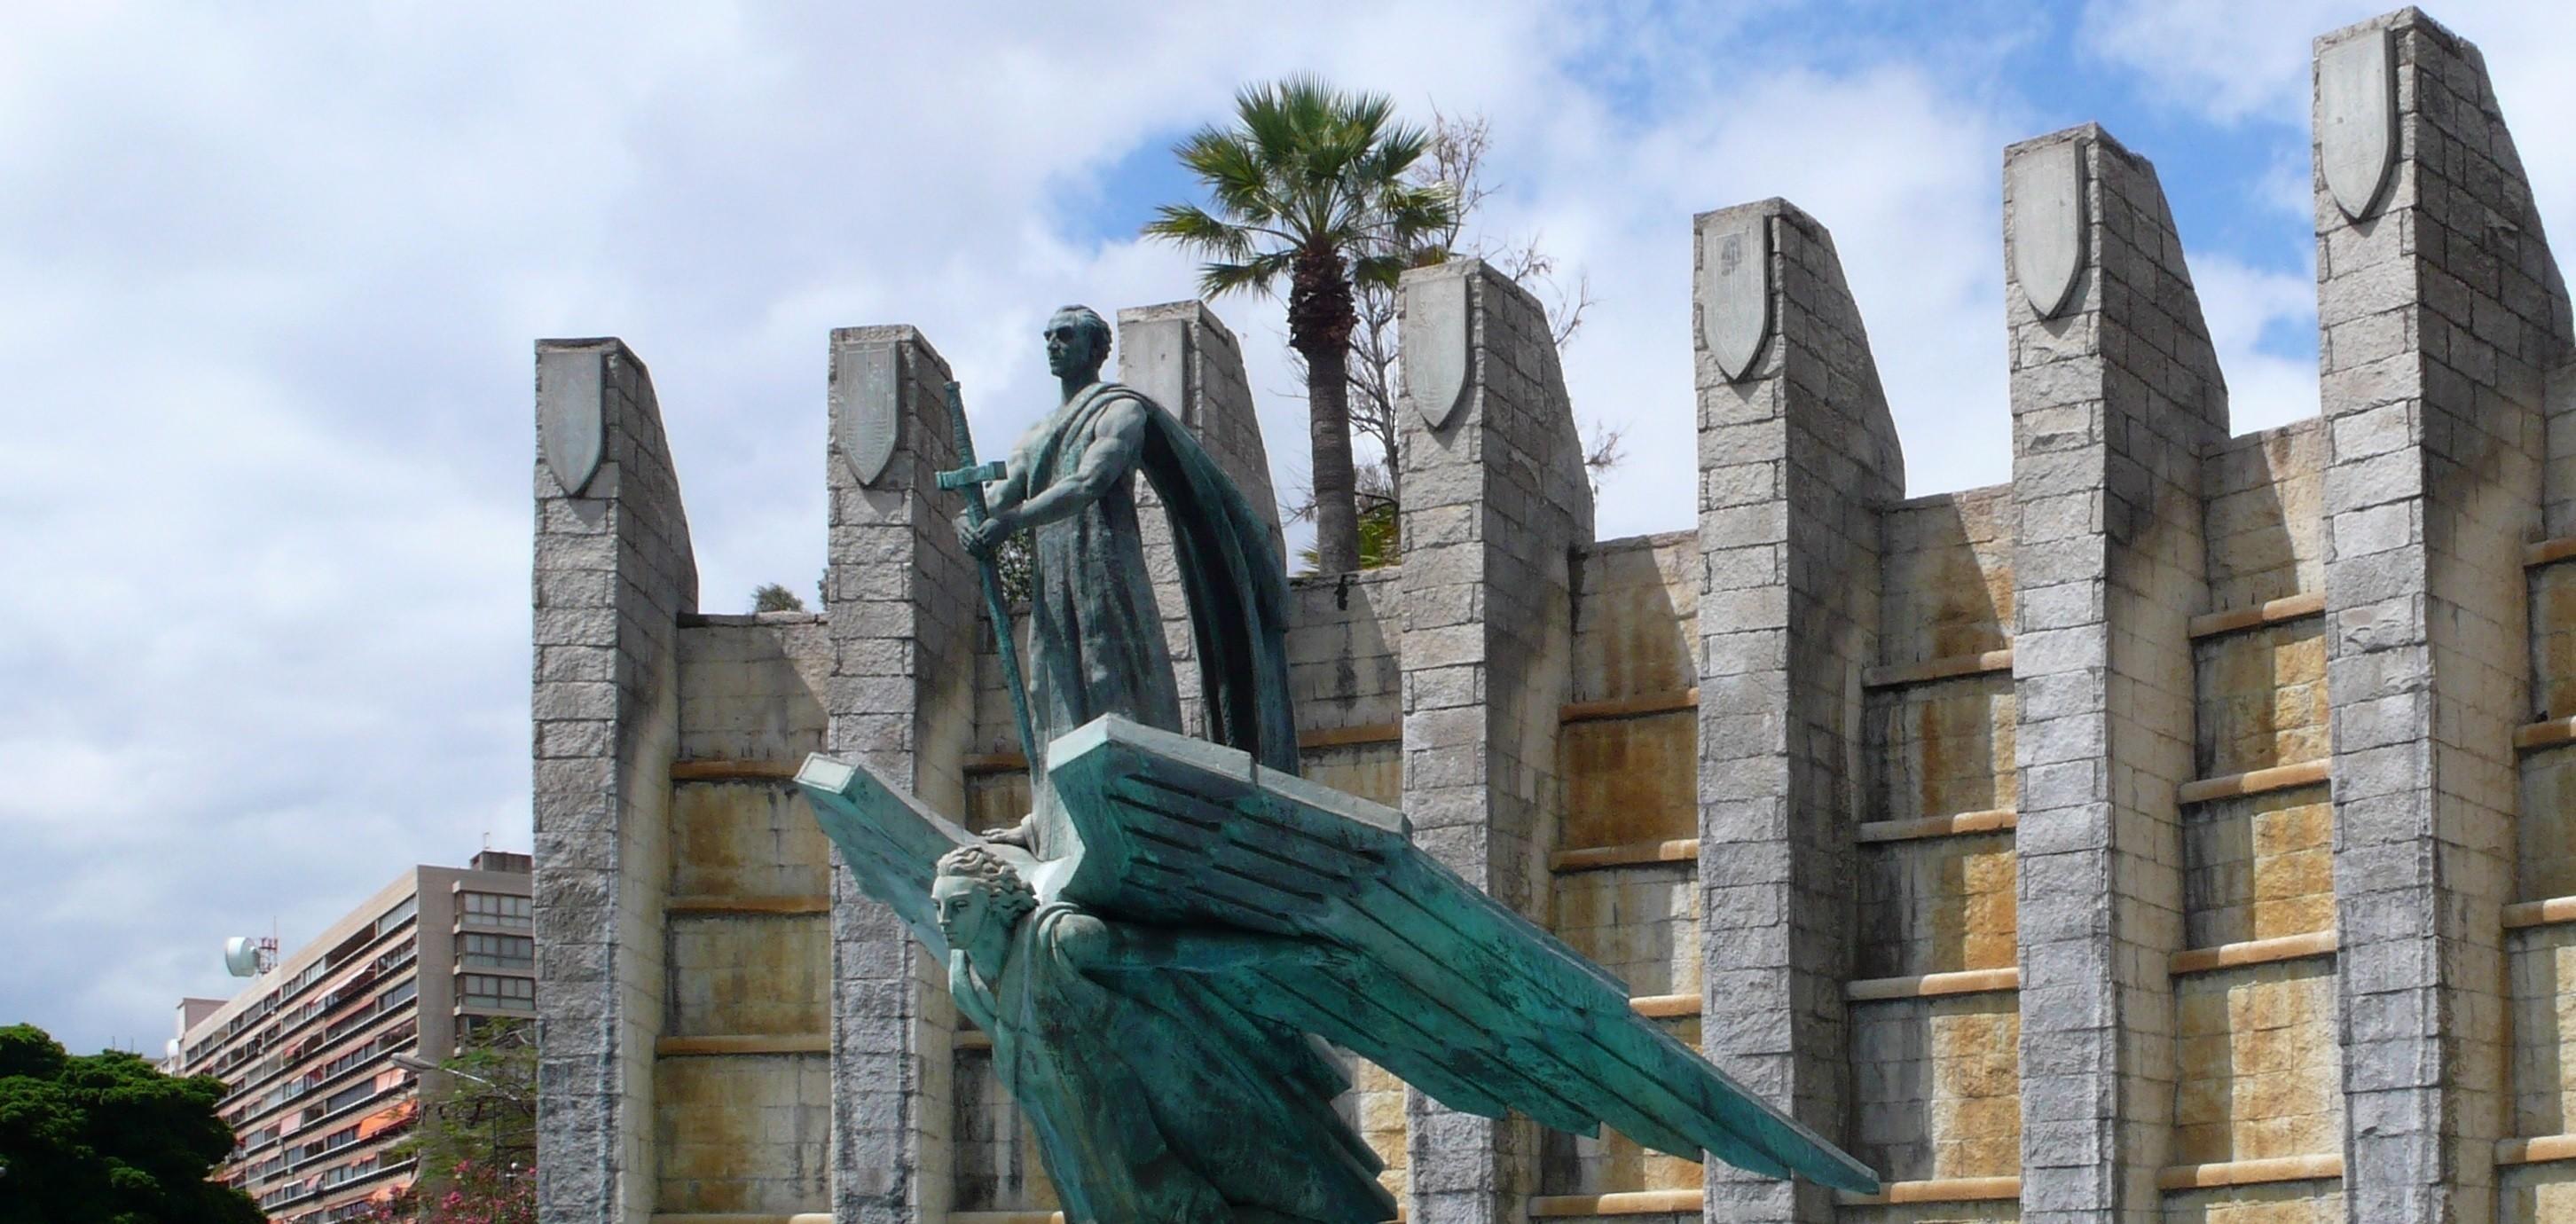 Un informe reclama proteger la última estatua de Franco en Santa Cruz de Tenerife